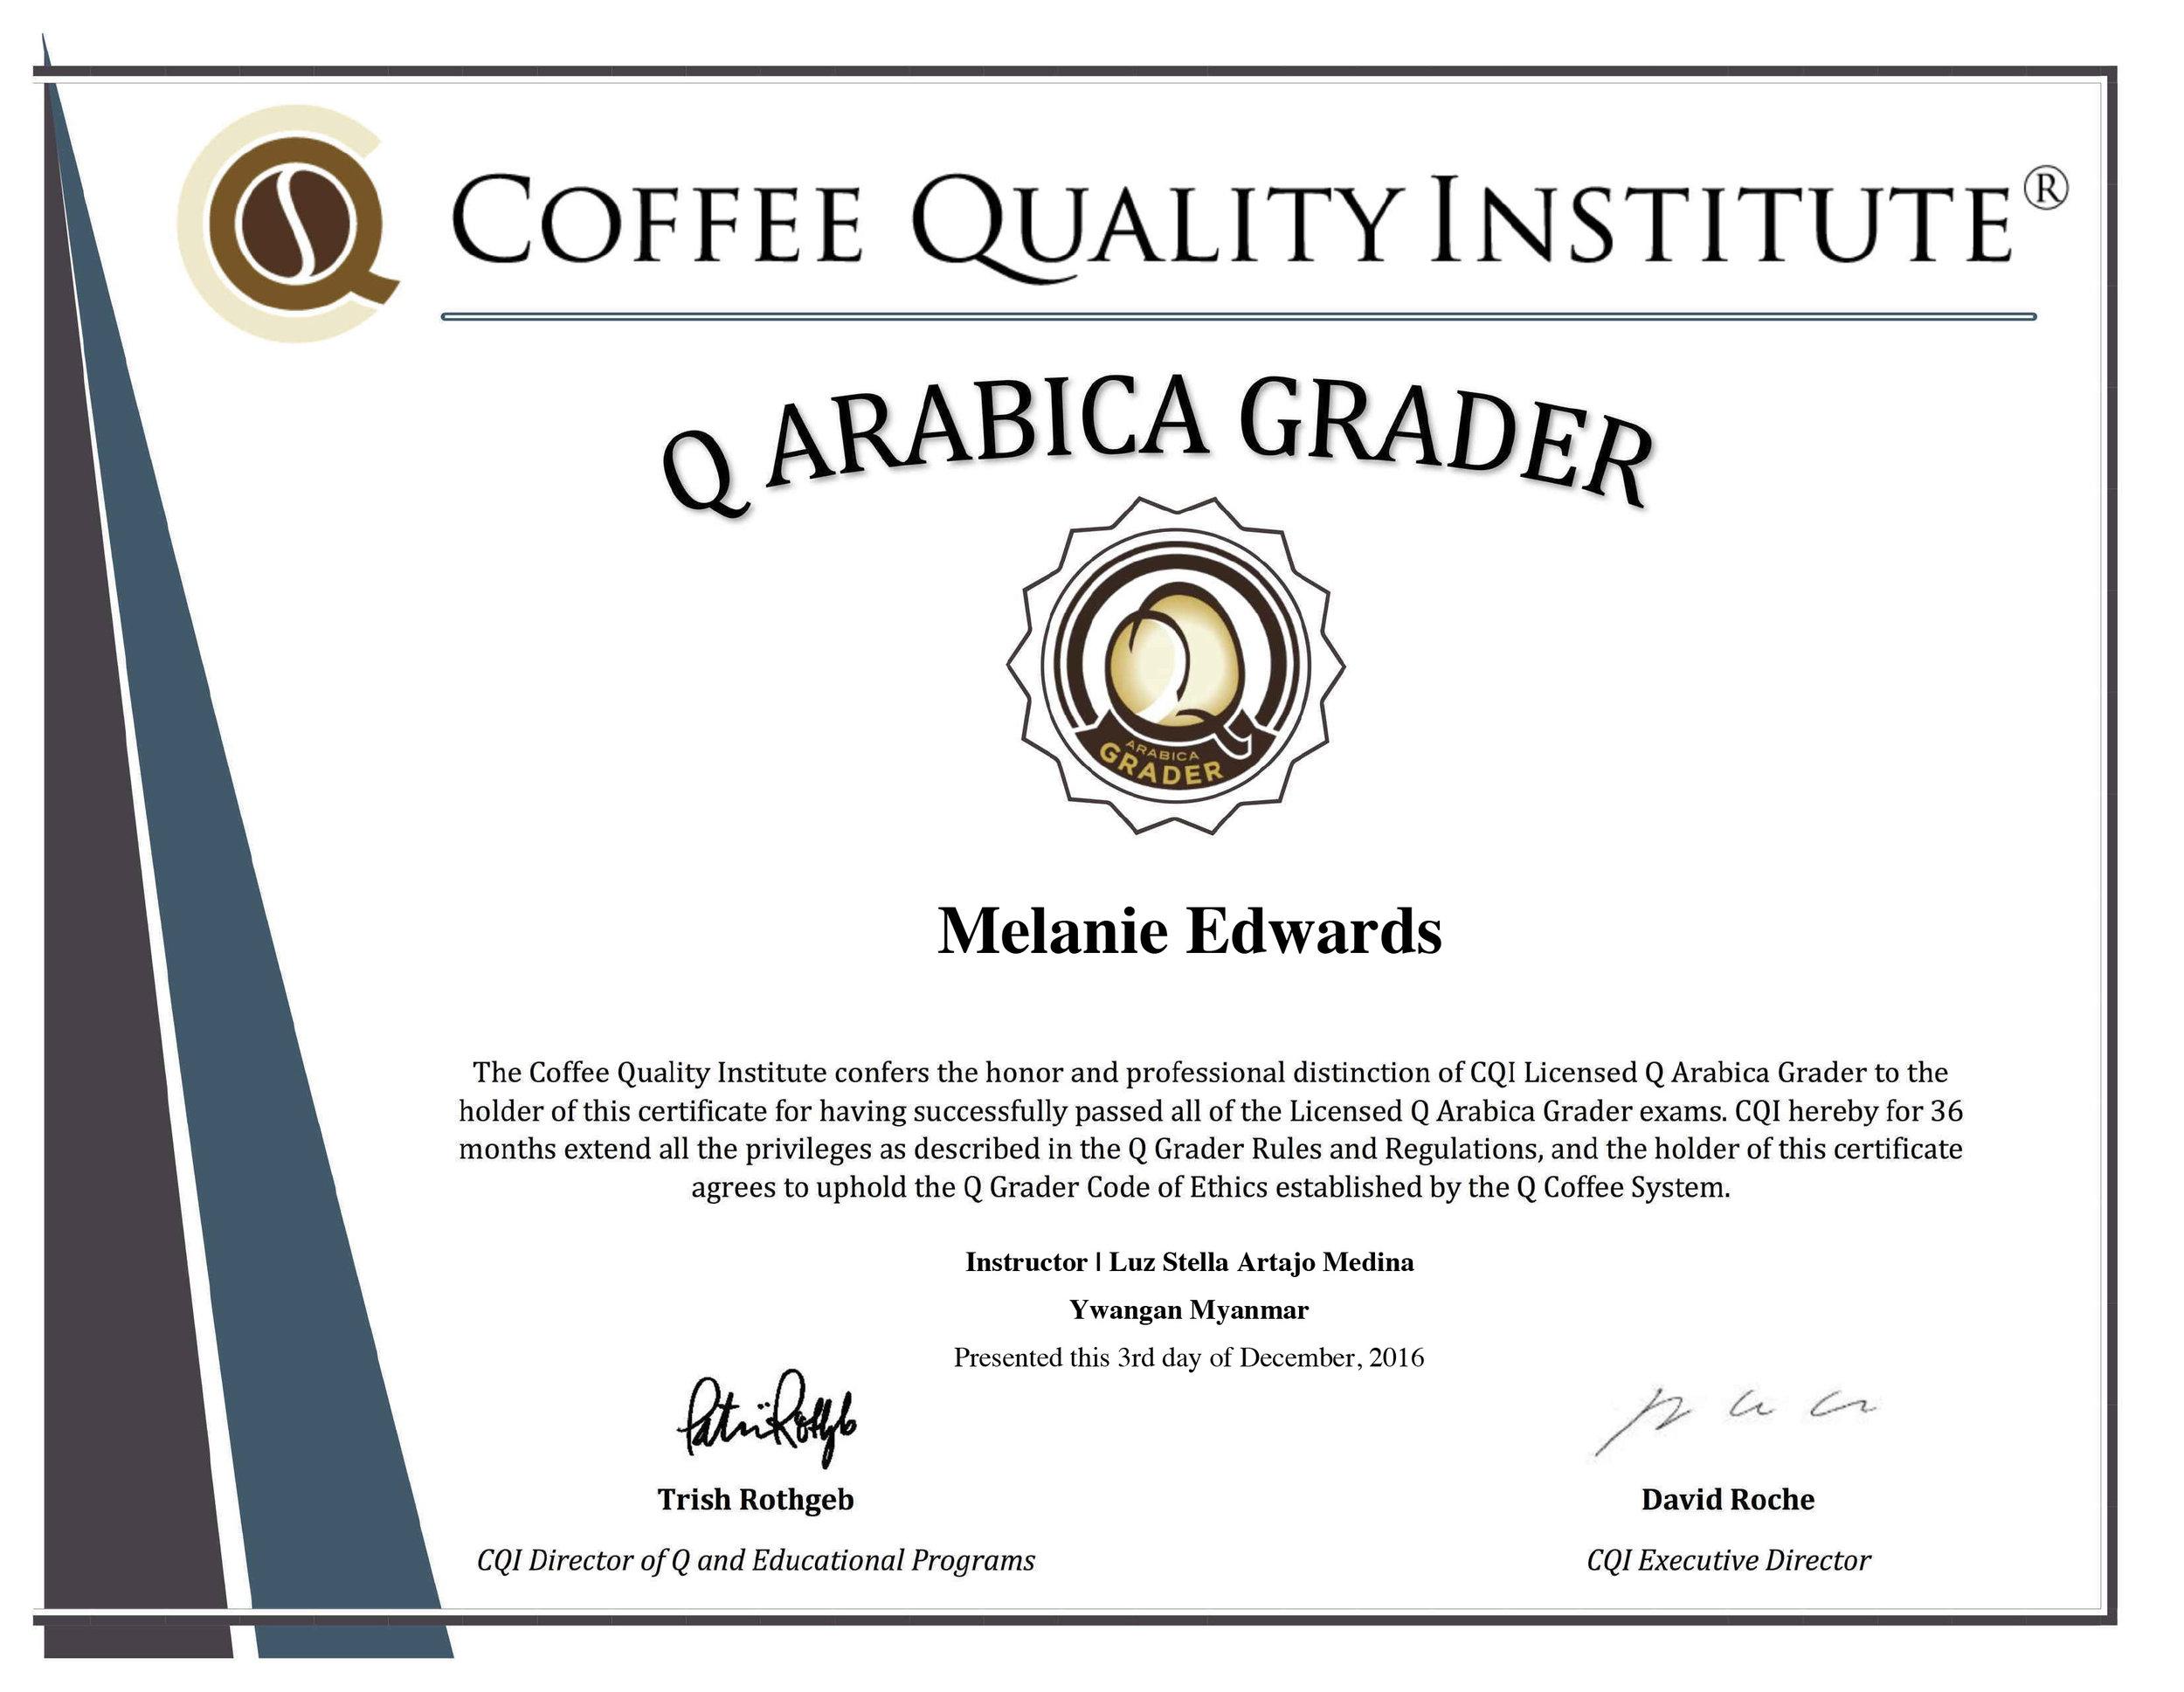 certificate_Melanie Edwards-4.jpg